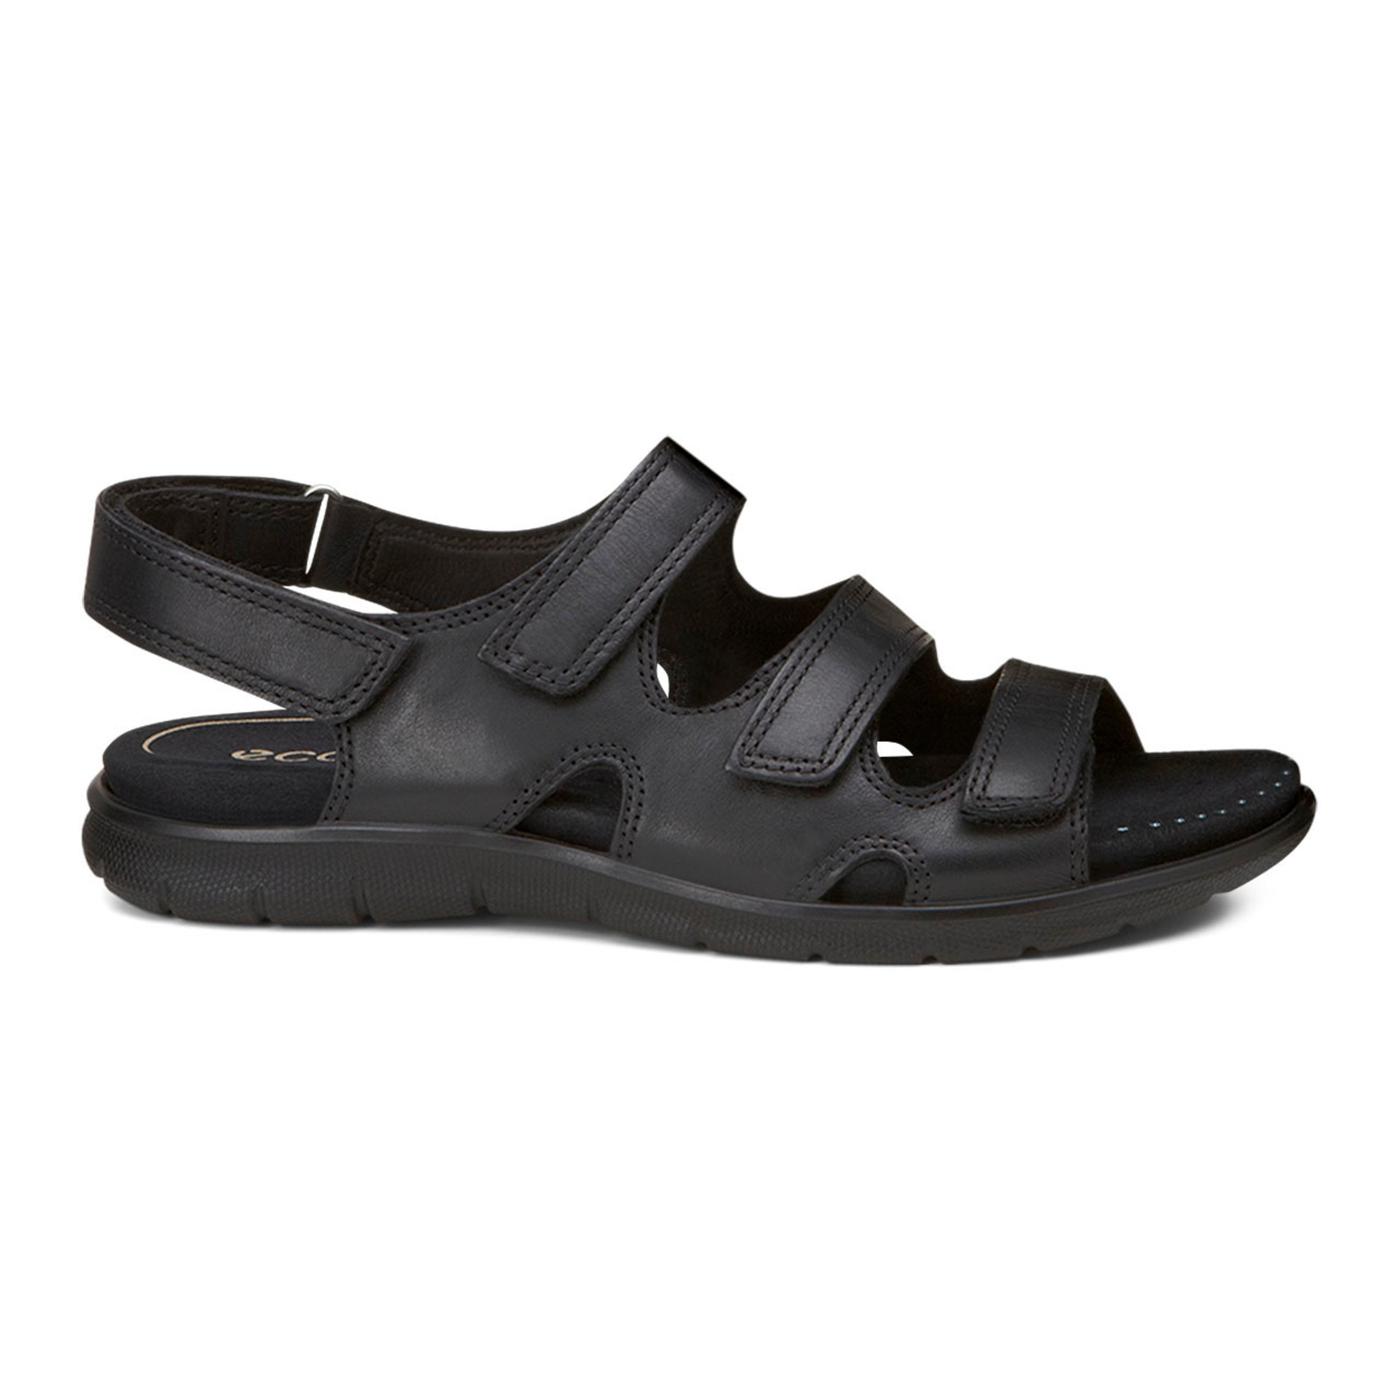 ECCO Babett Sandal 3 Strap